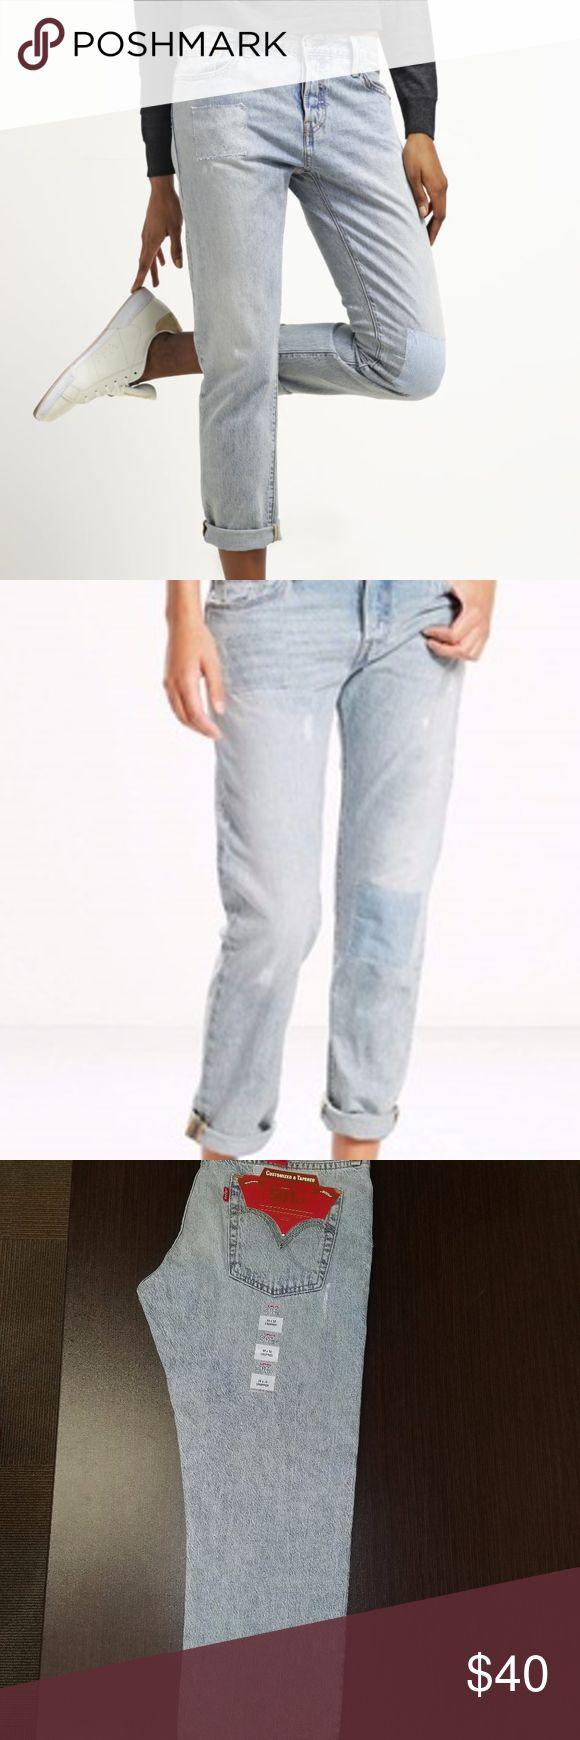 Women Jeans Levi's® 501 CT- Tapered Jeans Women Jeans Levi's® 501 CT - Tapered Jeans - Sunset Patch, loose fit inner thigh Levi's Jeans Boyfriend